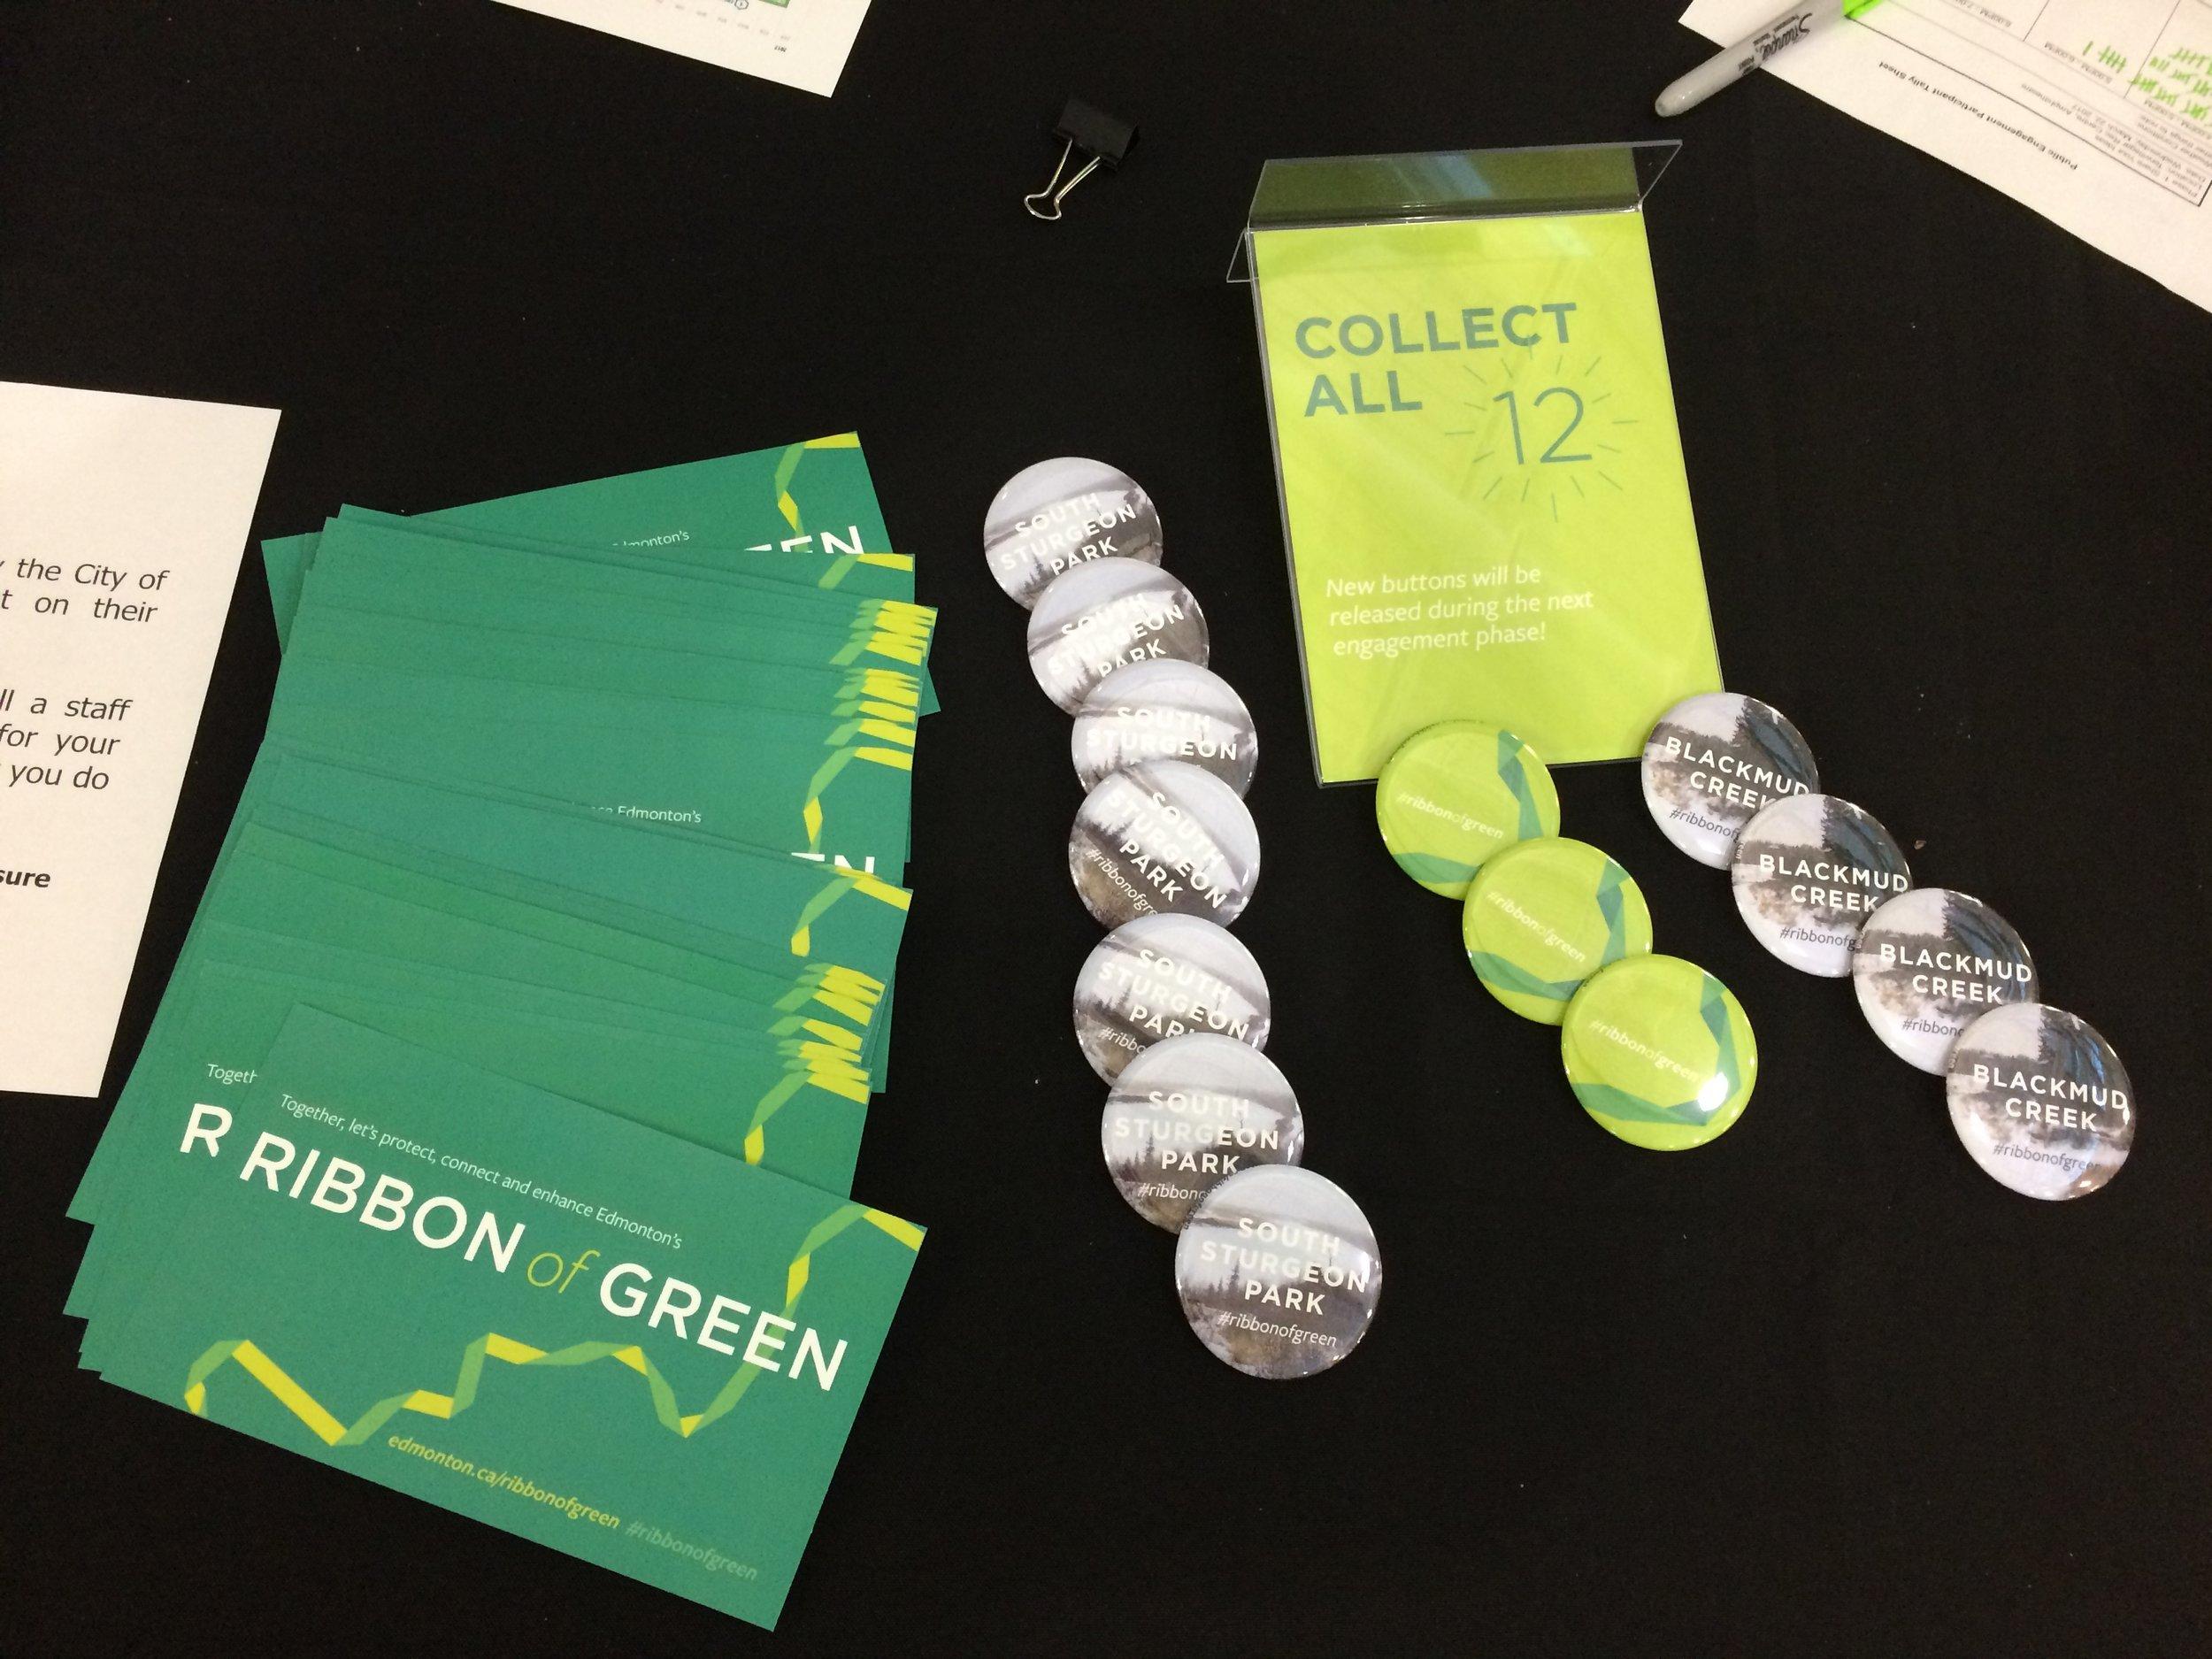 O2-ribbon-of-green2.jpg